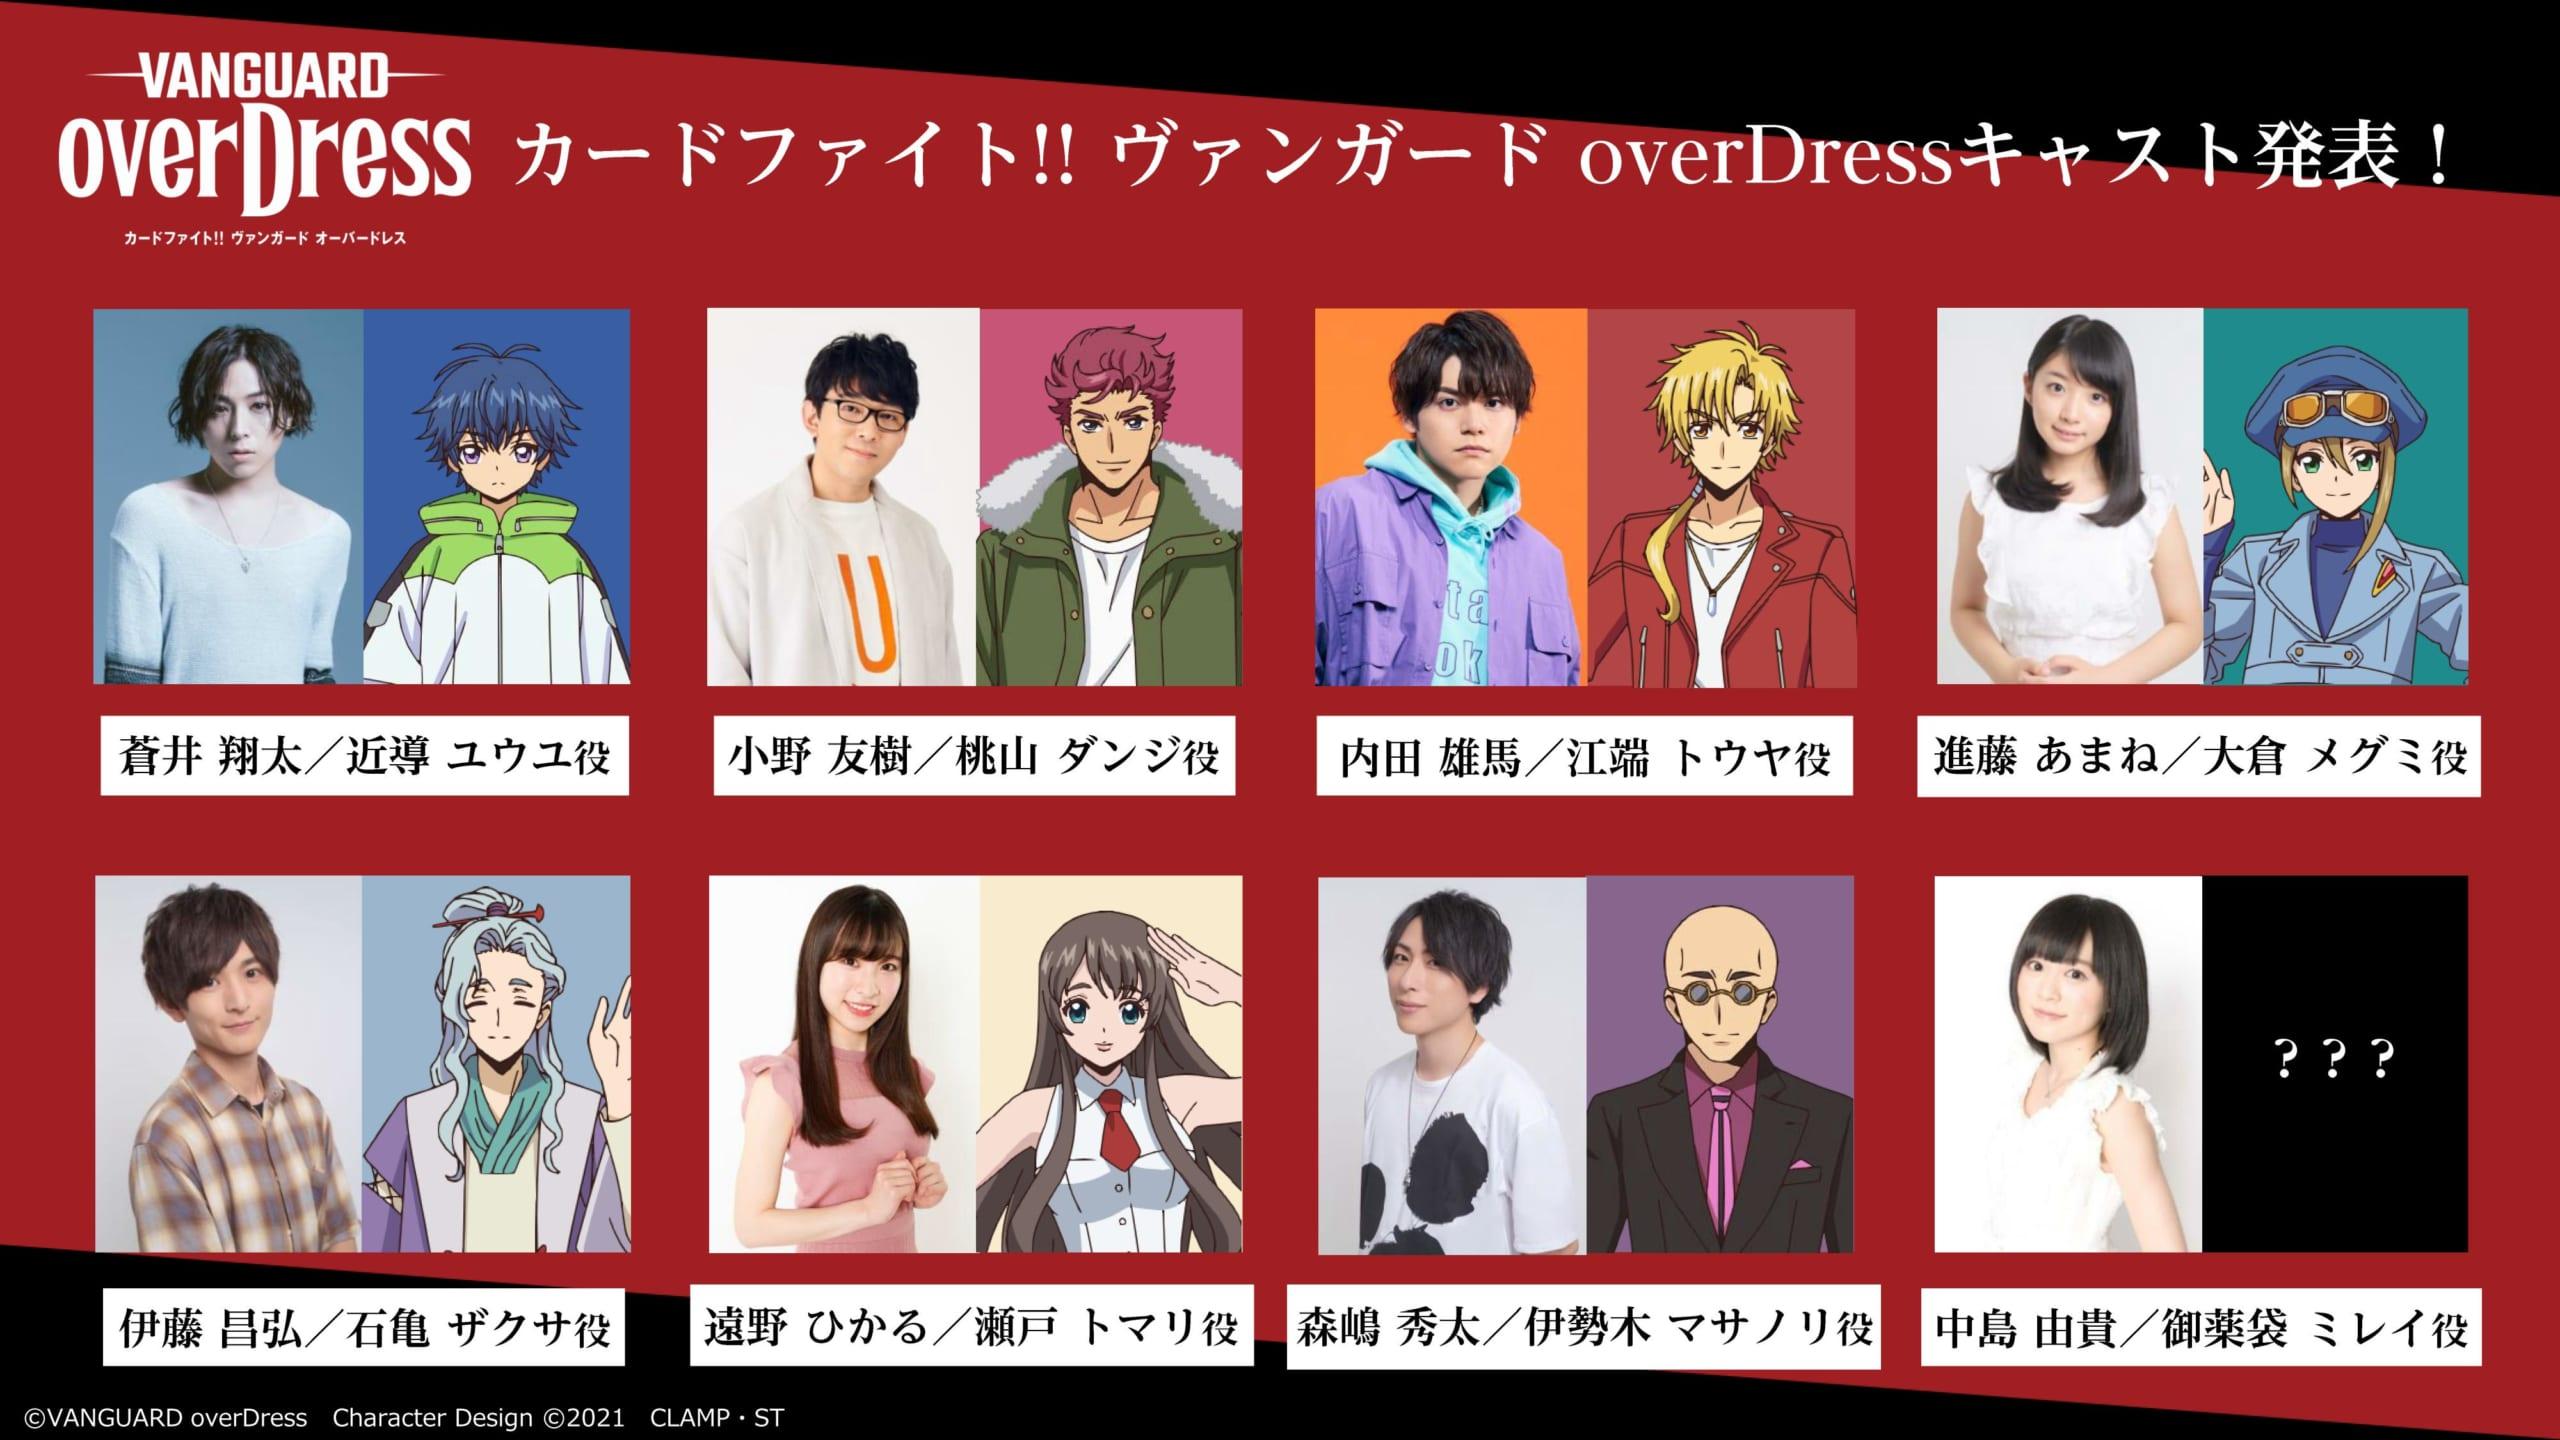 TVアニメ「カードファイト!! ヴァンガード overDress」キャスト